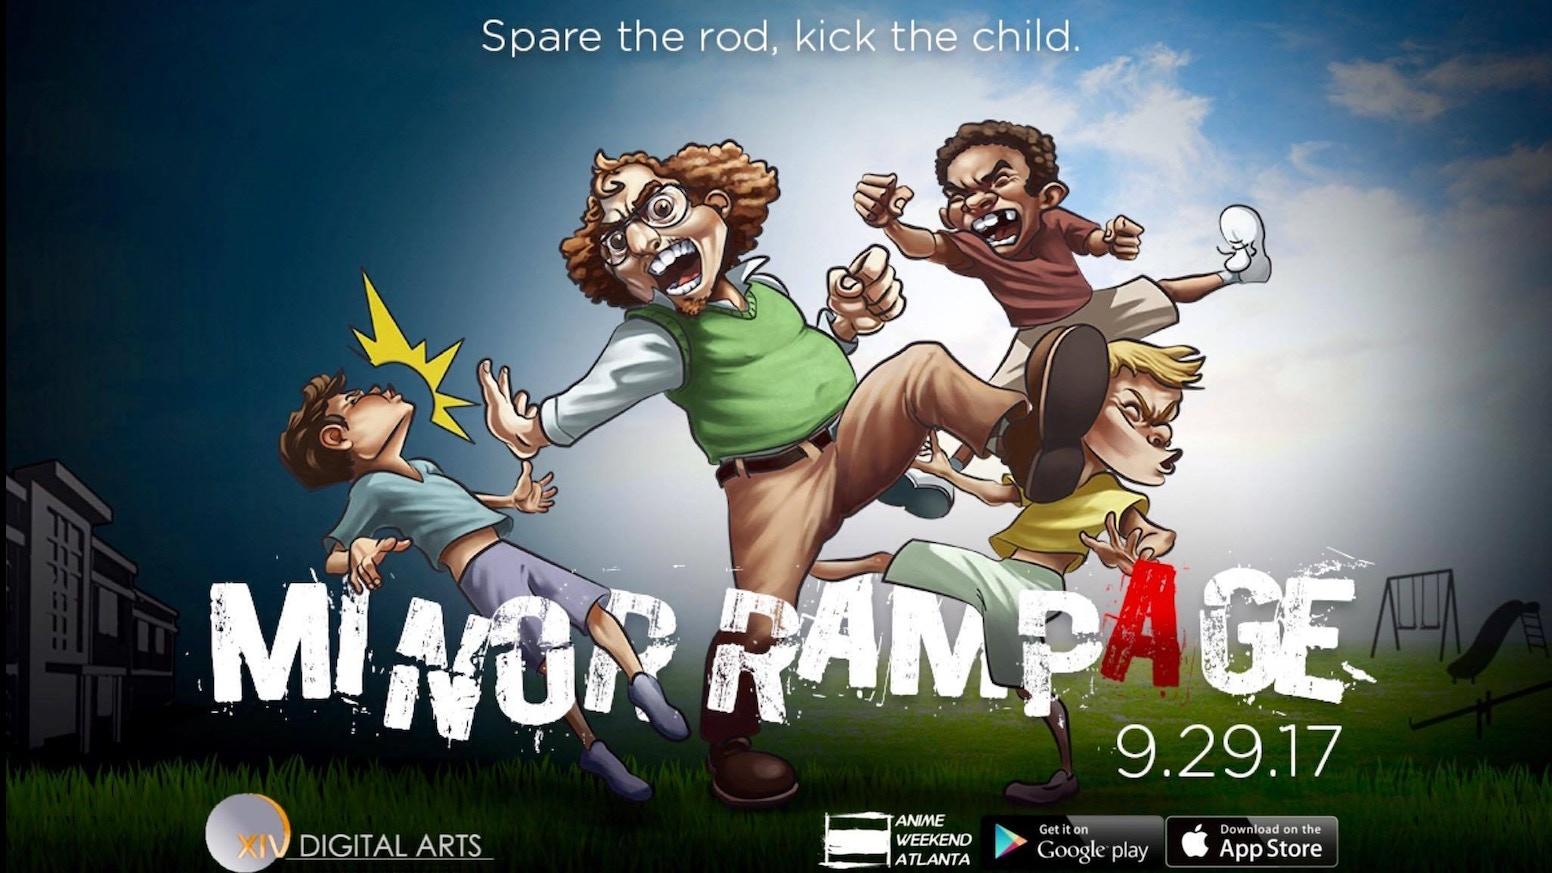 Minor Rampage By XIV Digital Arts Kickstarter